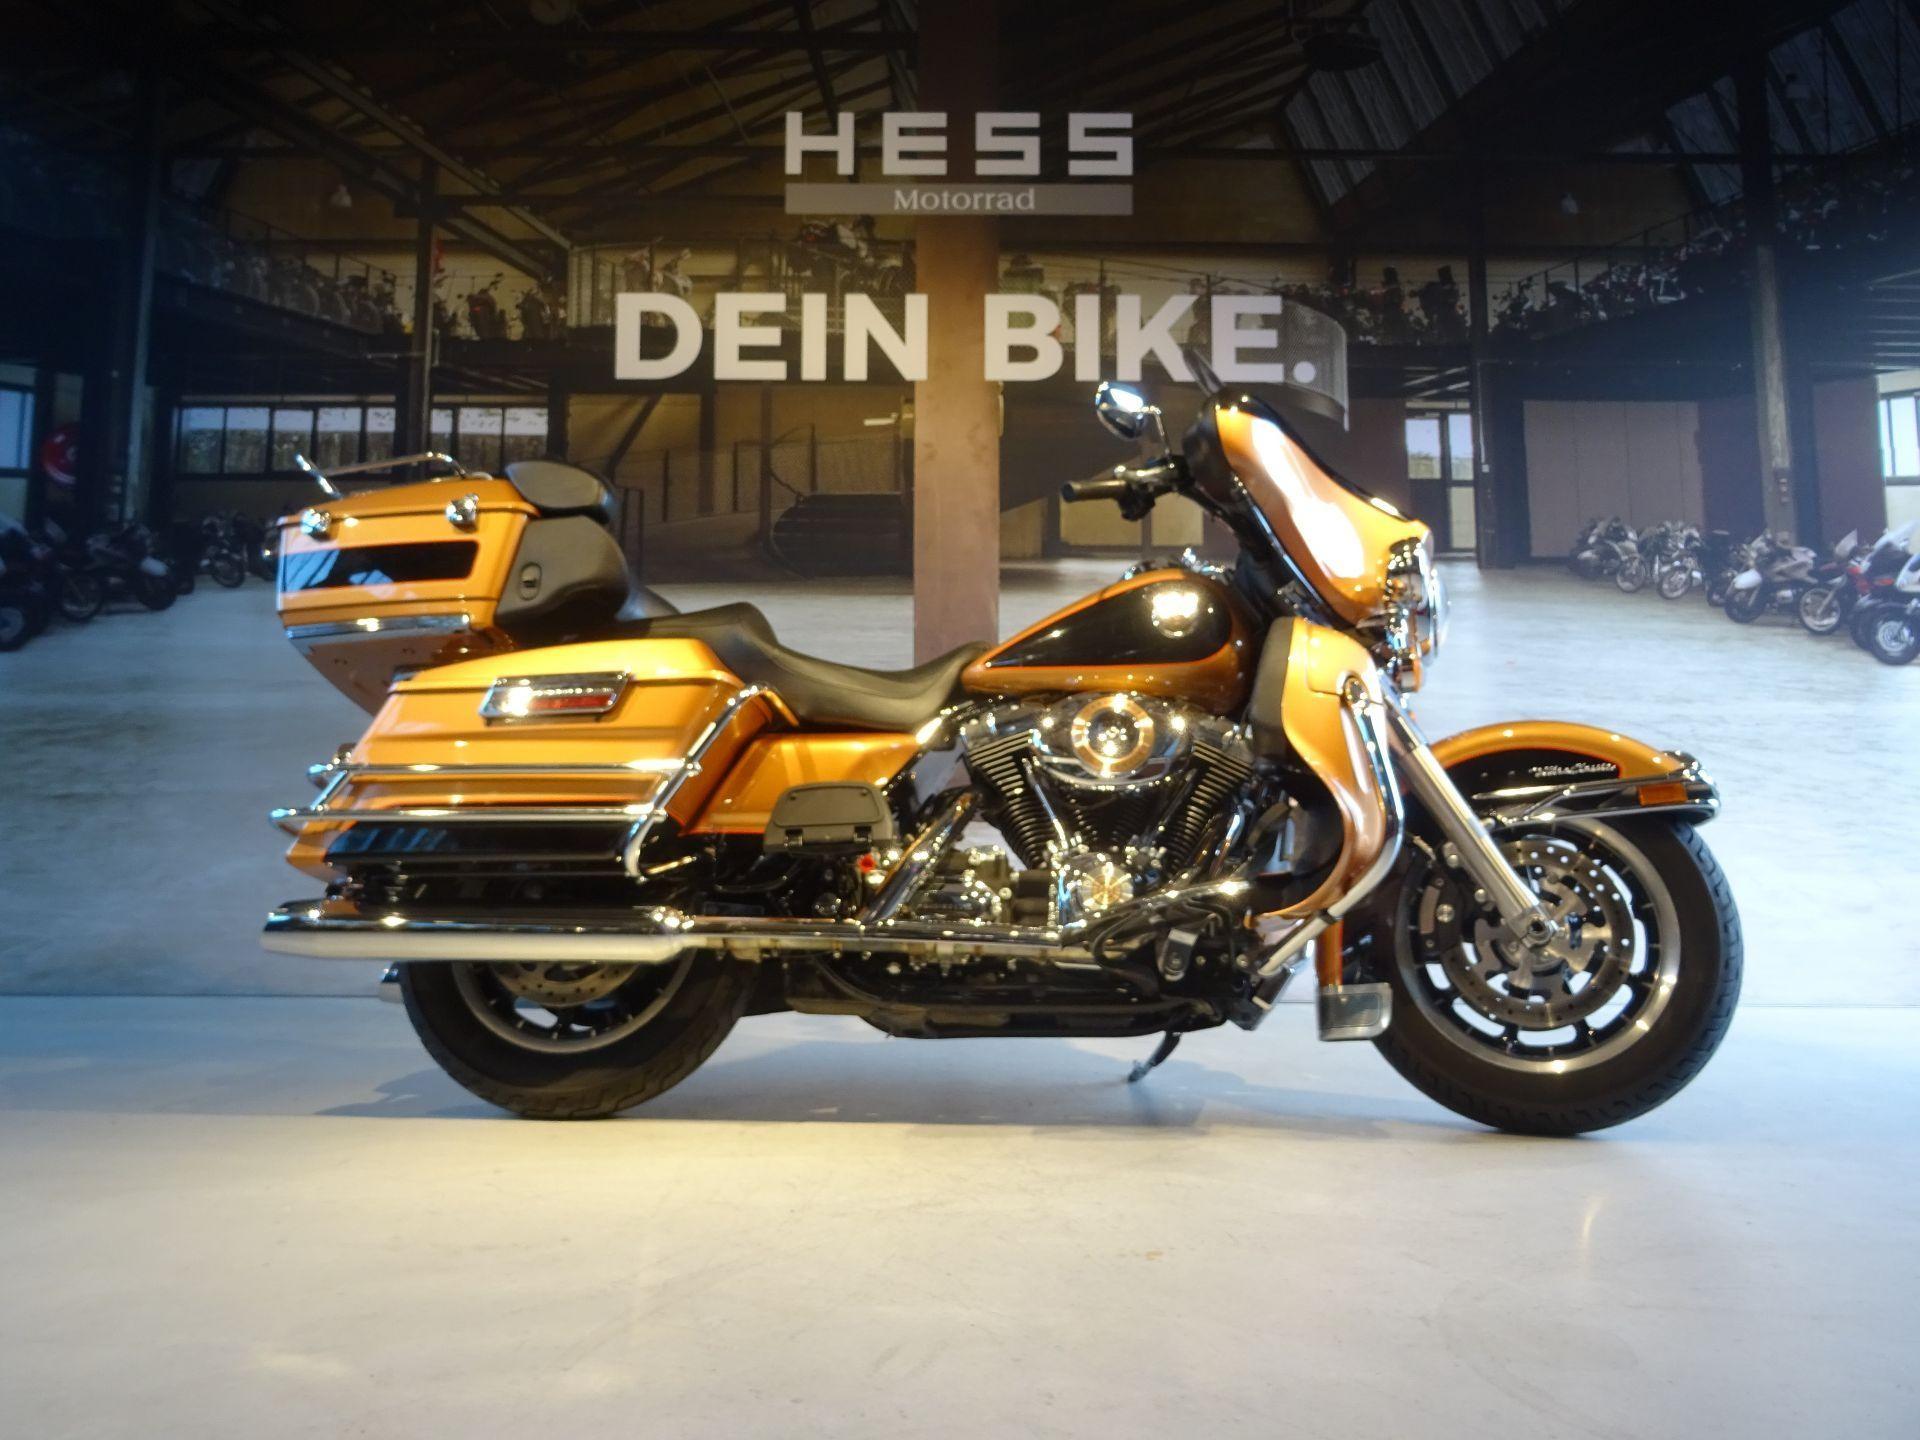 moto occasions acheter harley davidson flhtcu 1584 electra glide ultra classic abs hess motorrad. Black Bedroom Furniture Sets. Home Design Ideas